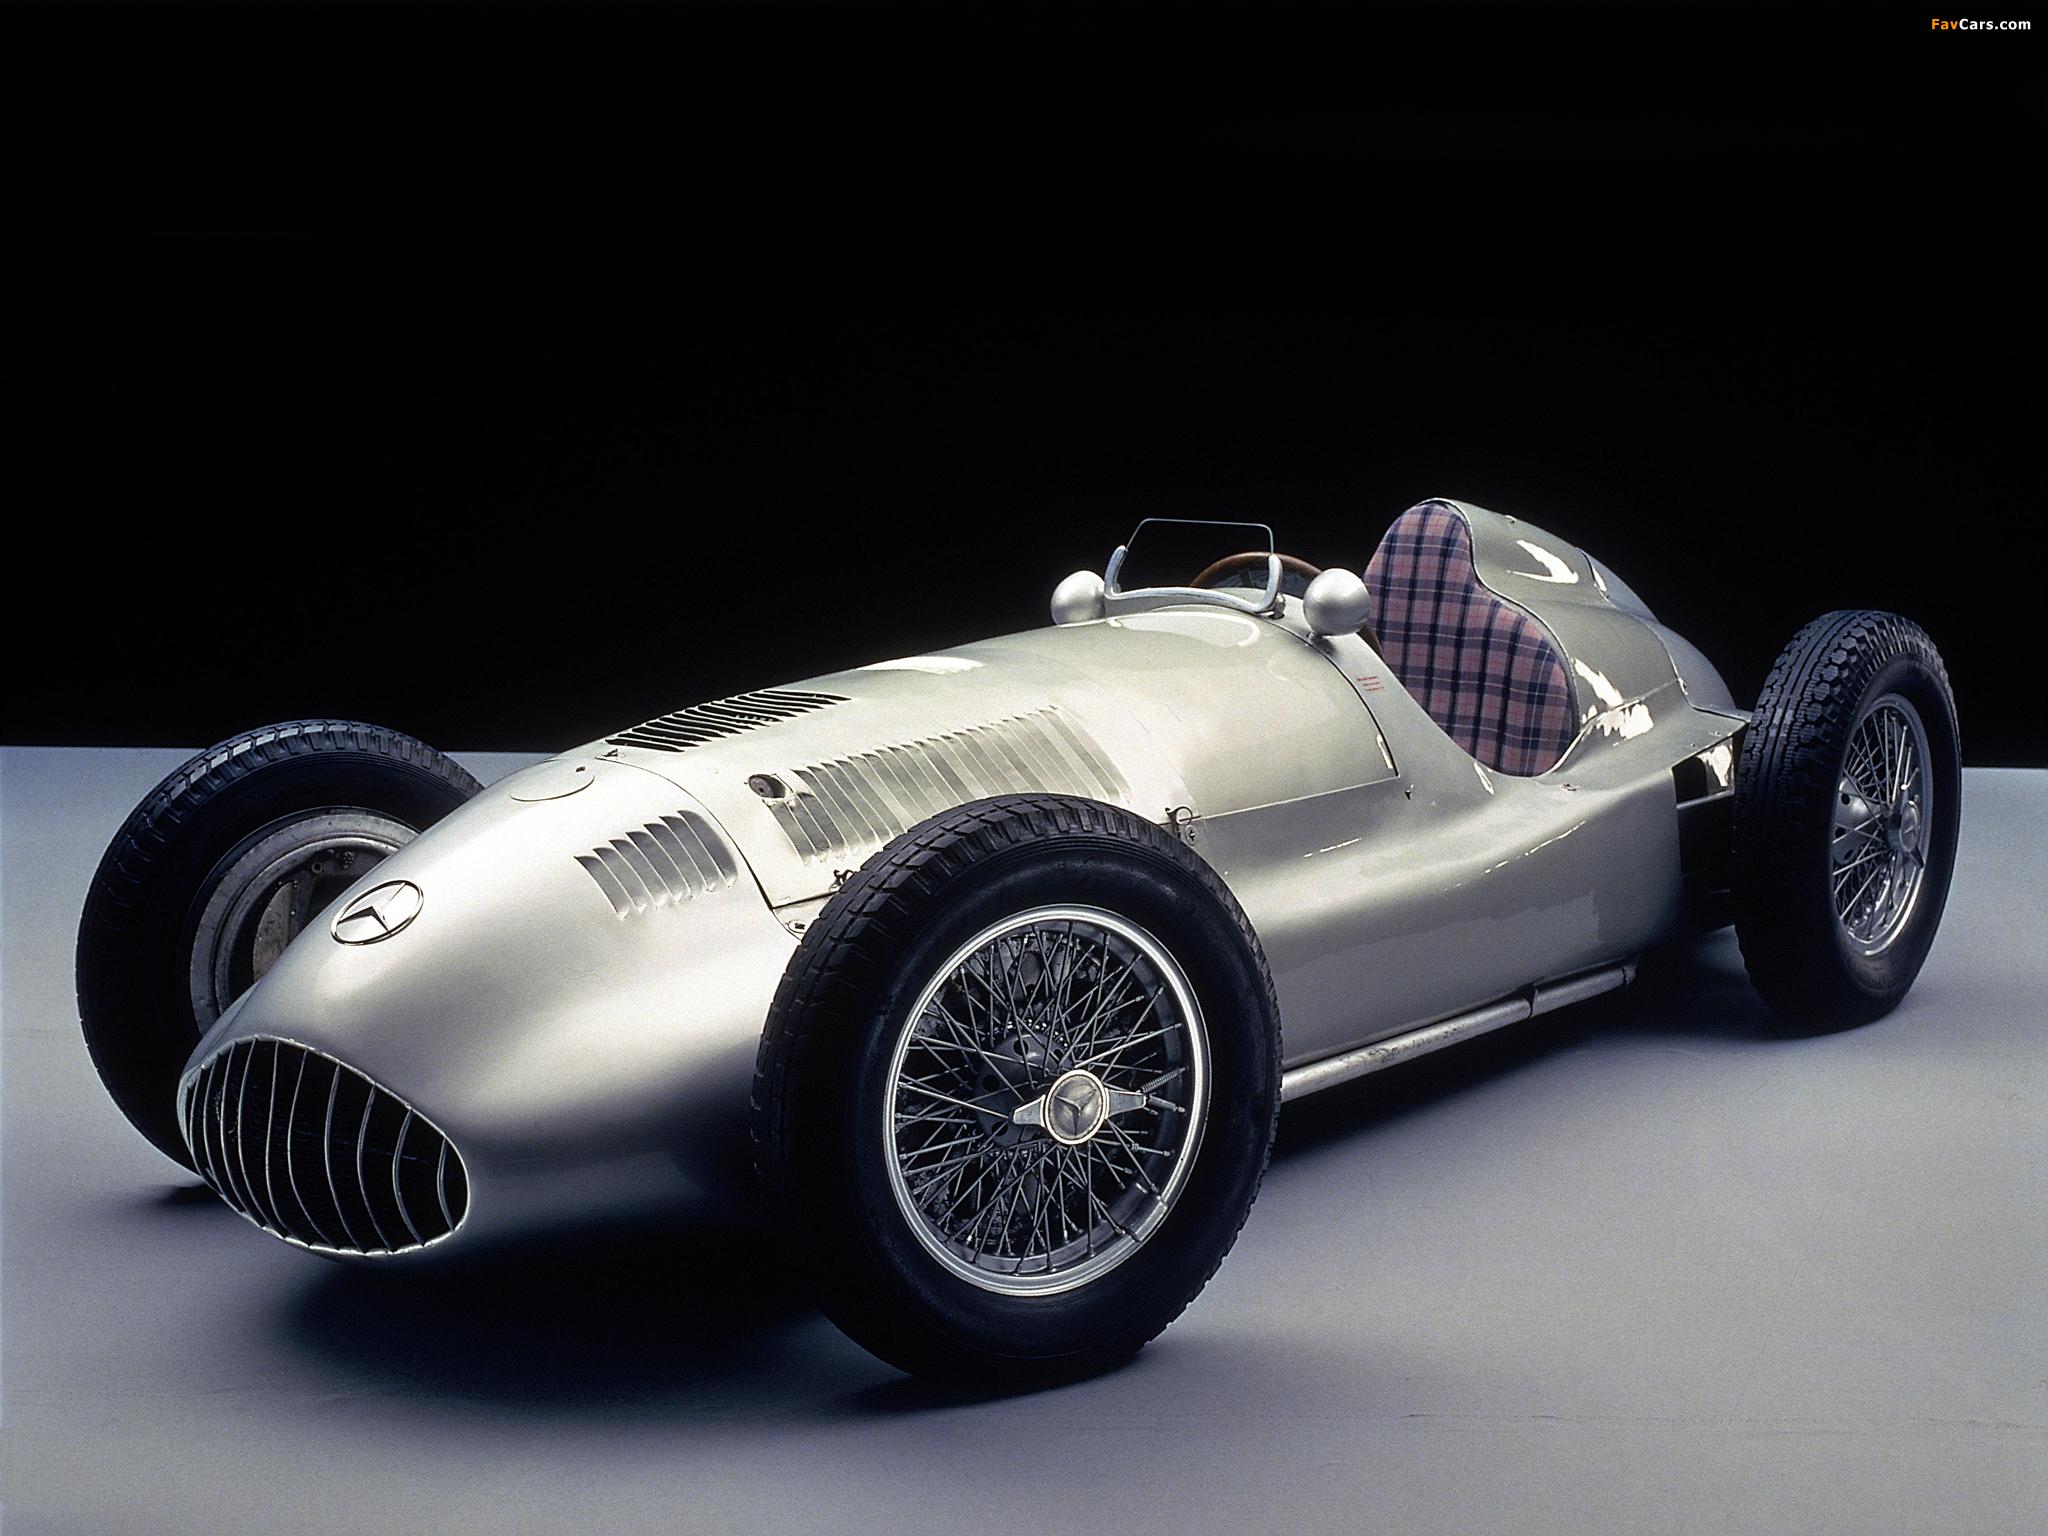 Mercedes benz formula racing car w165 1939 photos for Mercedes benz race car